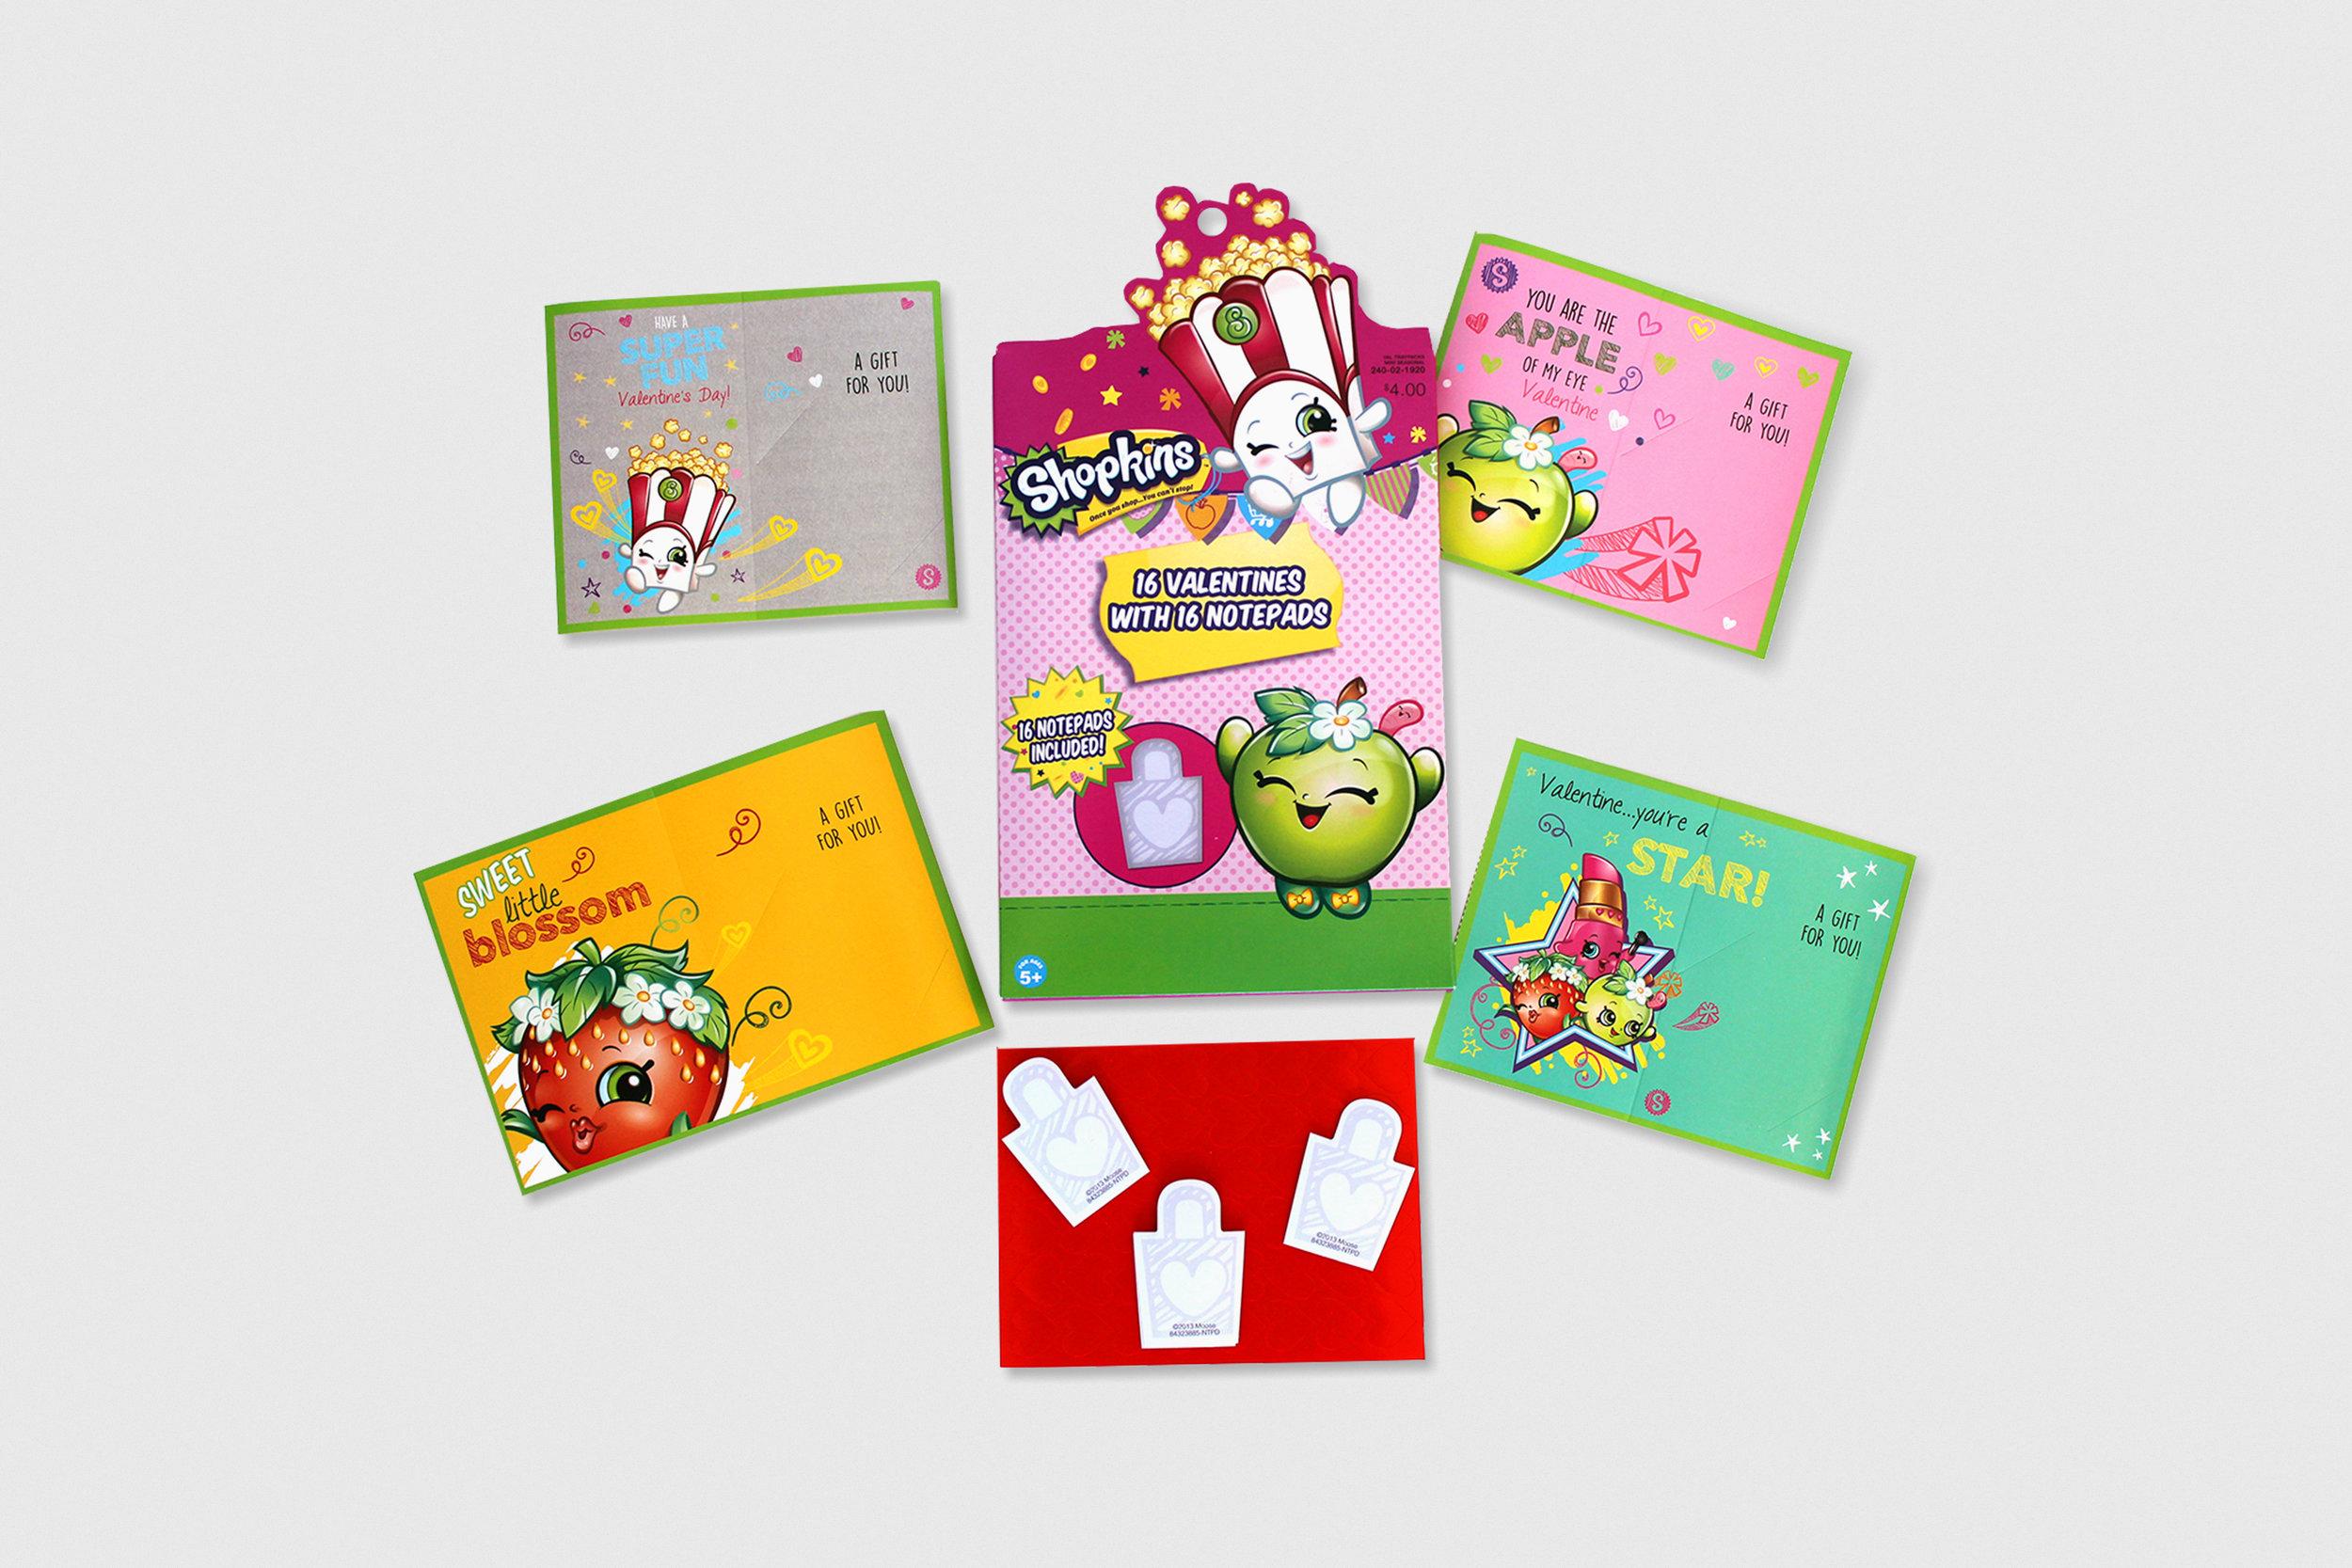 Shopkins-vday-cards.jpg